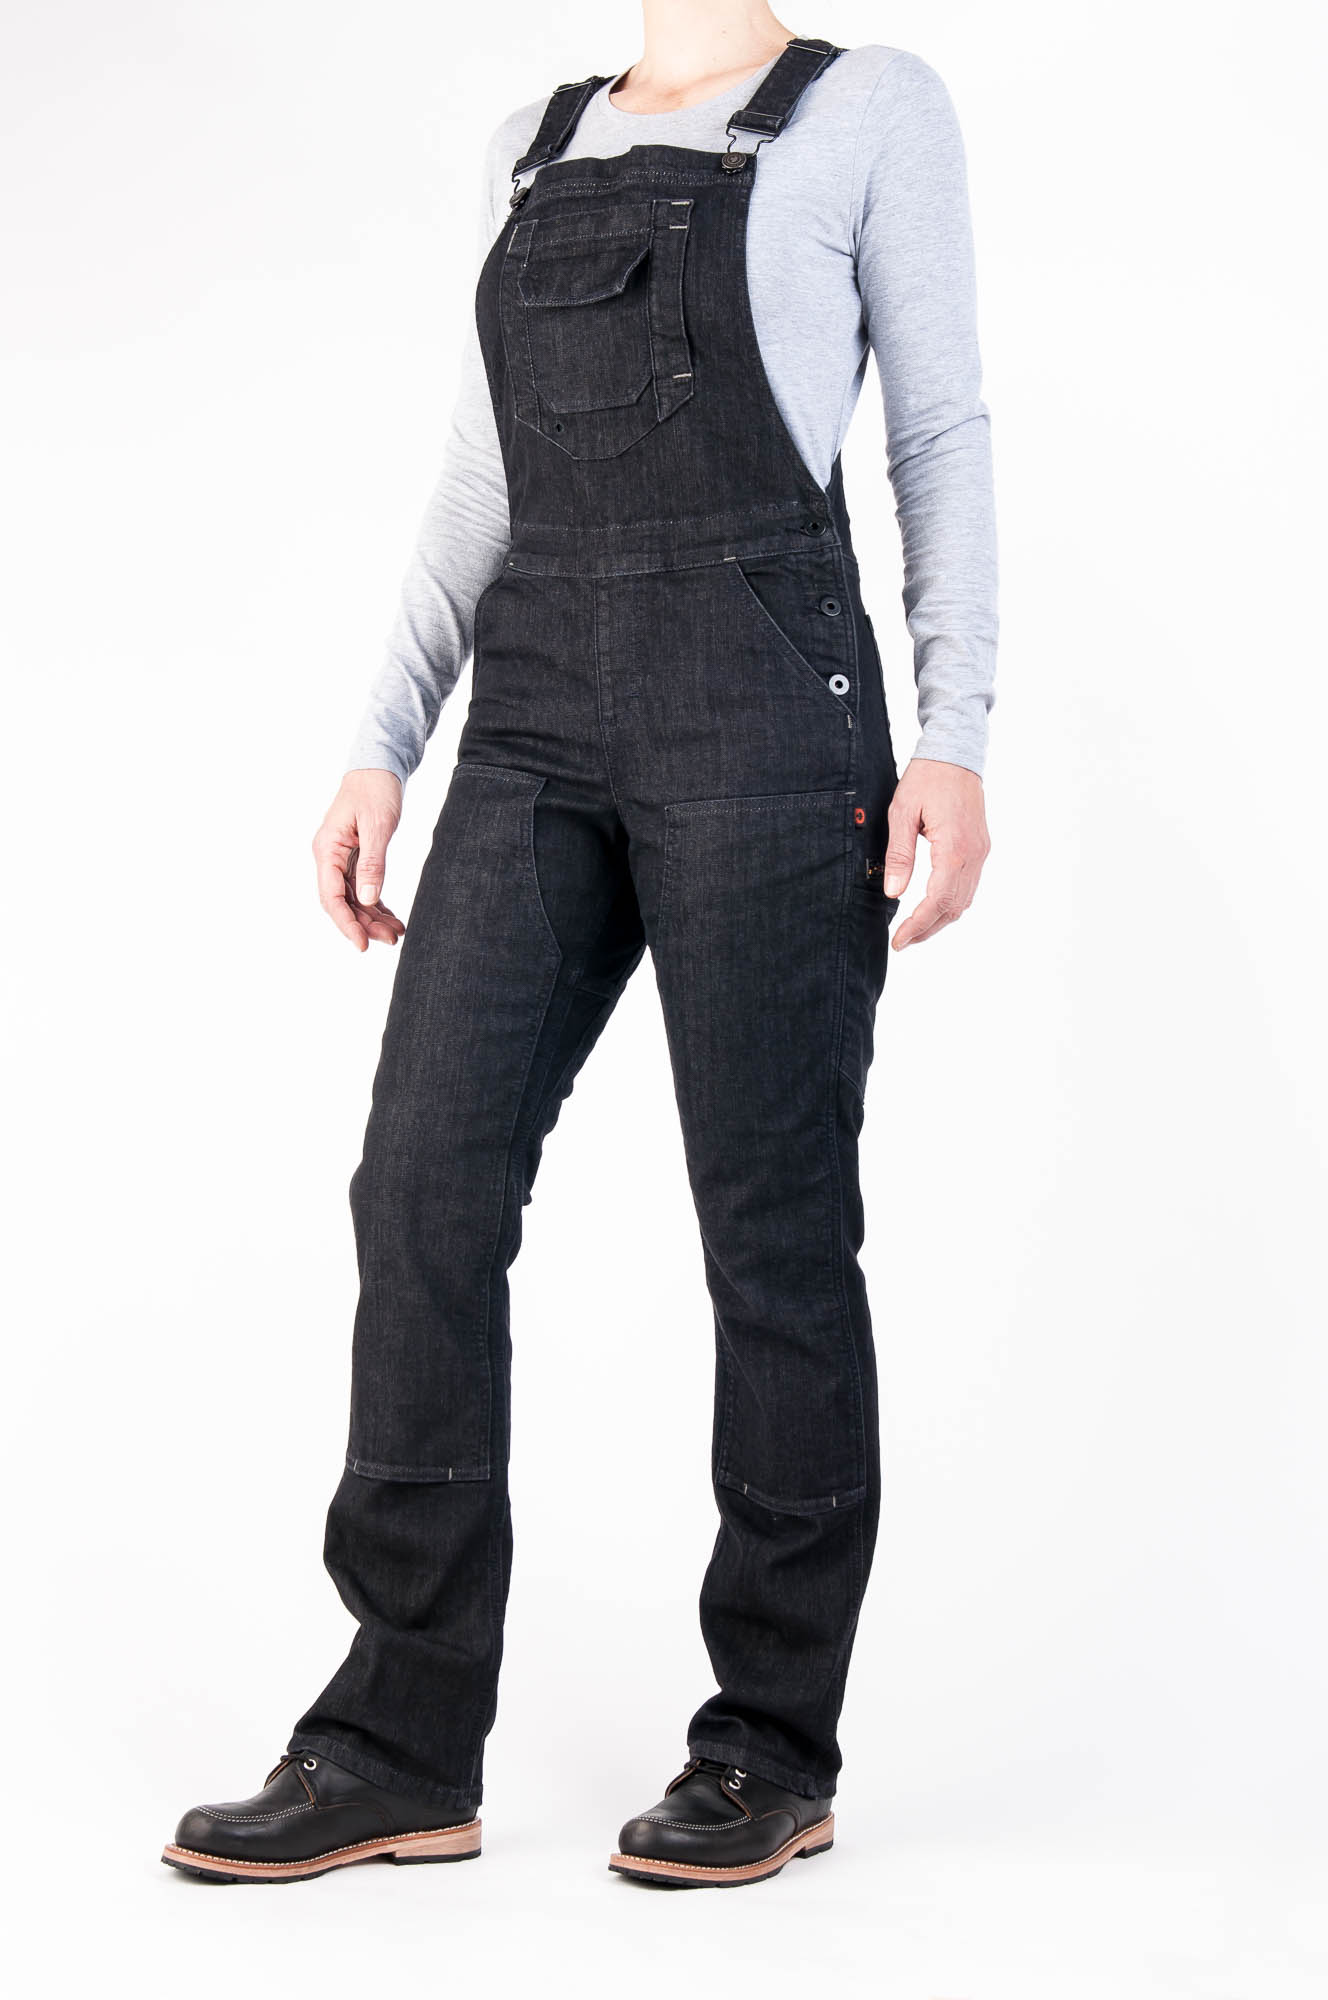 Freshley Overall Black Denim